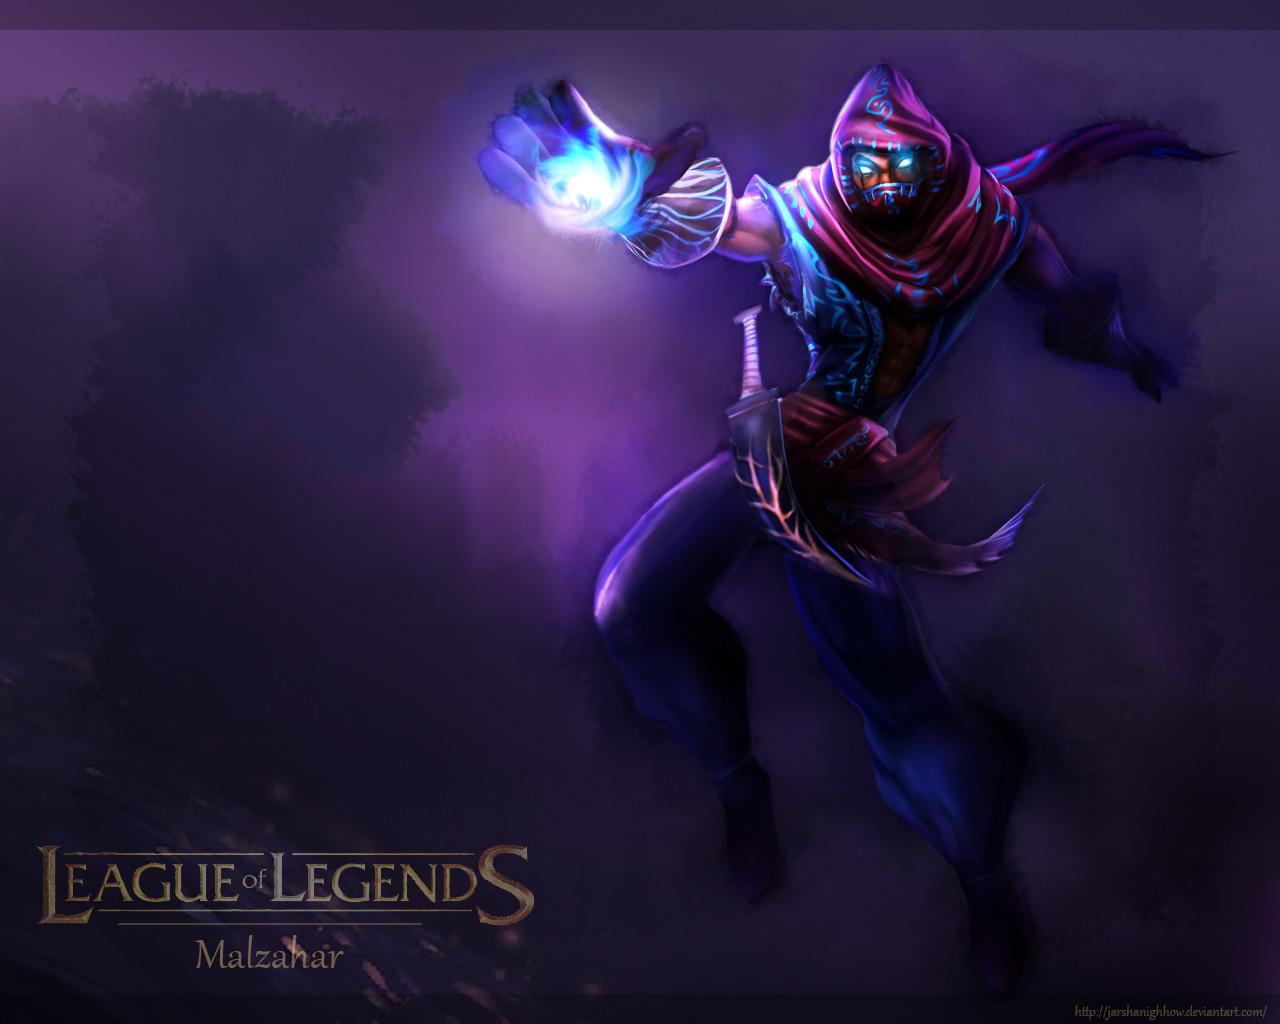 league of legends malzahar - photo #20